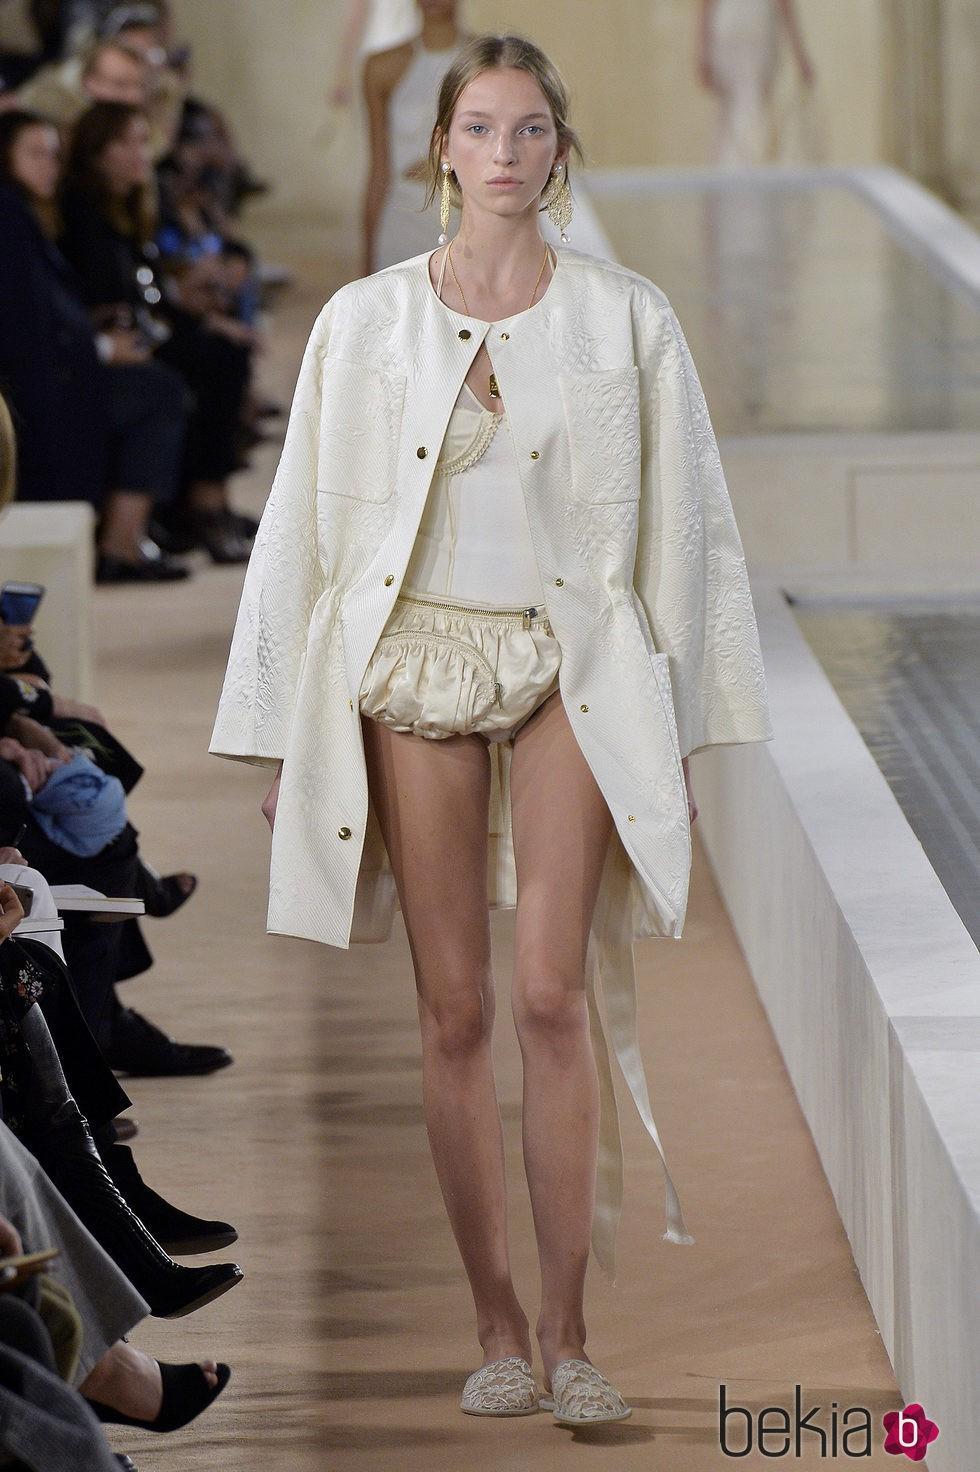 82e5288b46 Anterior Abrigo blanco de la colección primavera verano 2016 de Balenciaga  en Paris Fashion Week